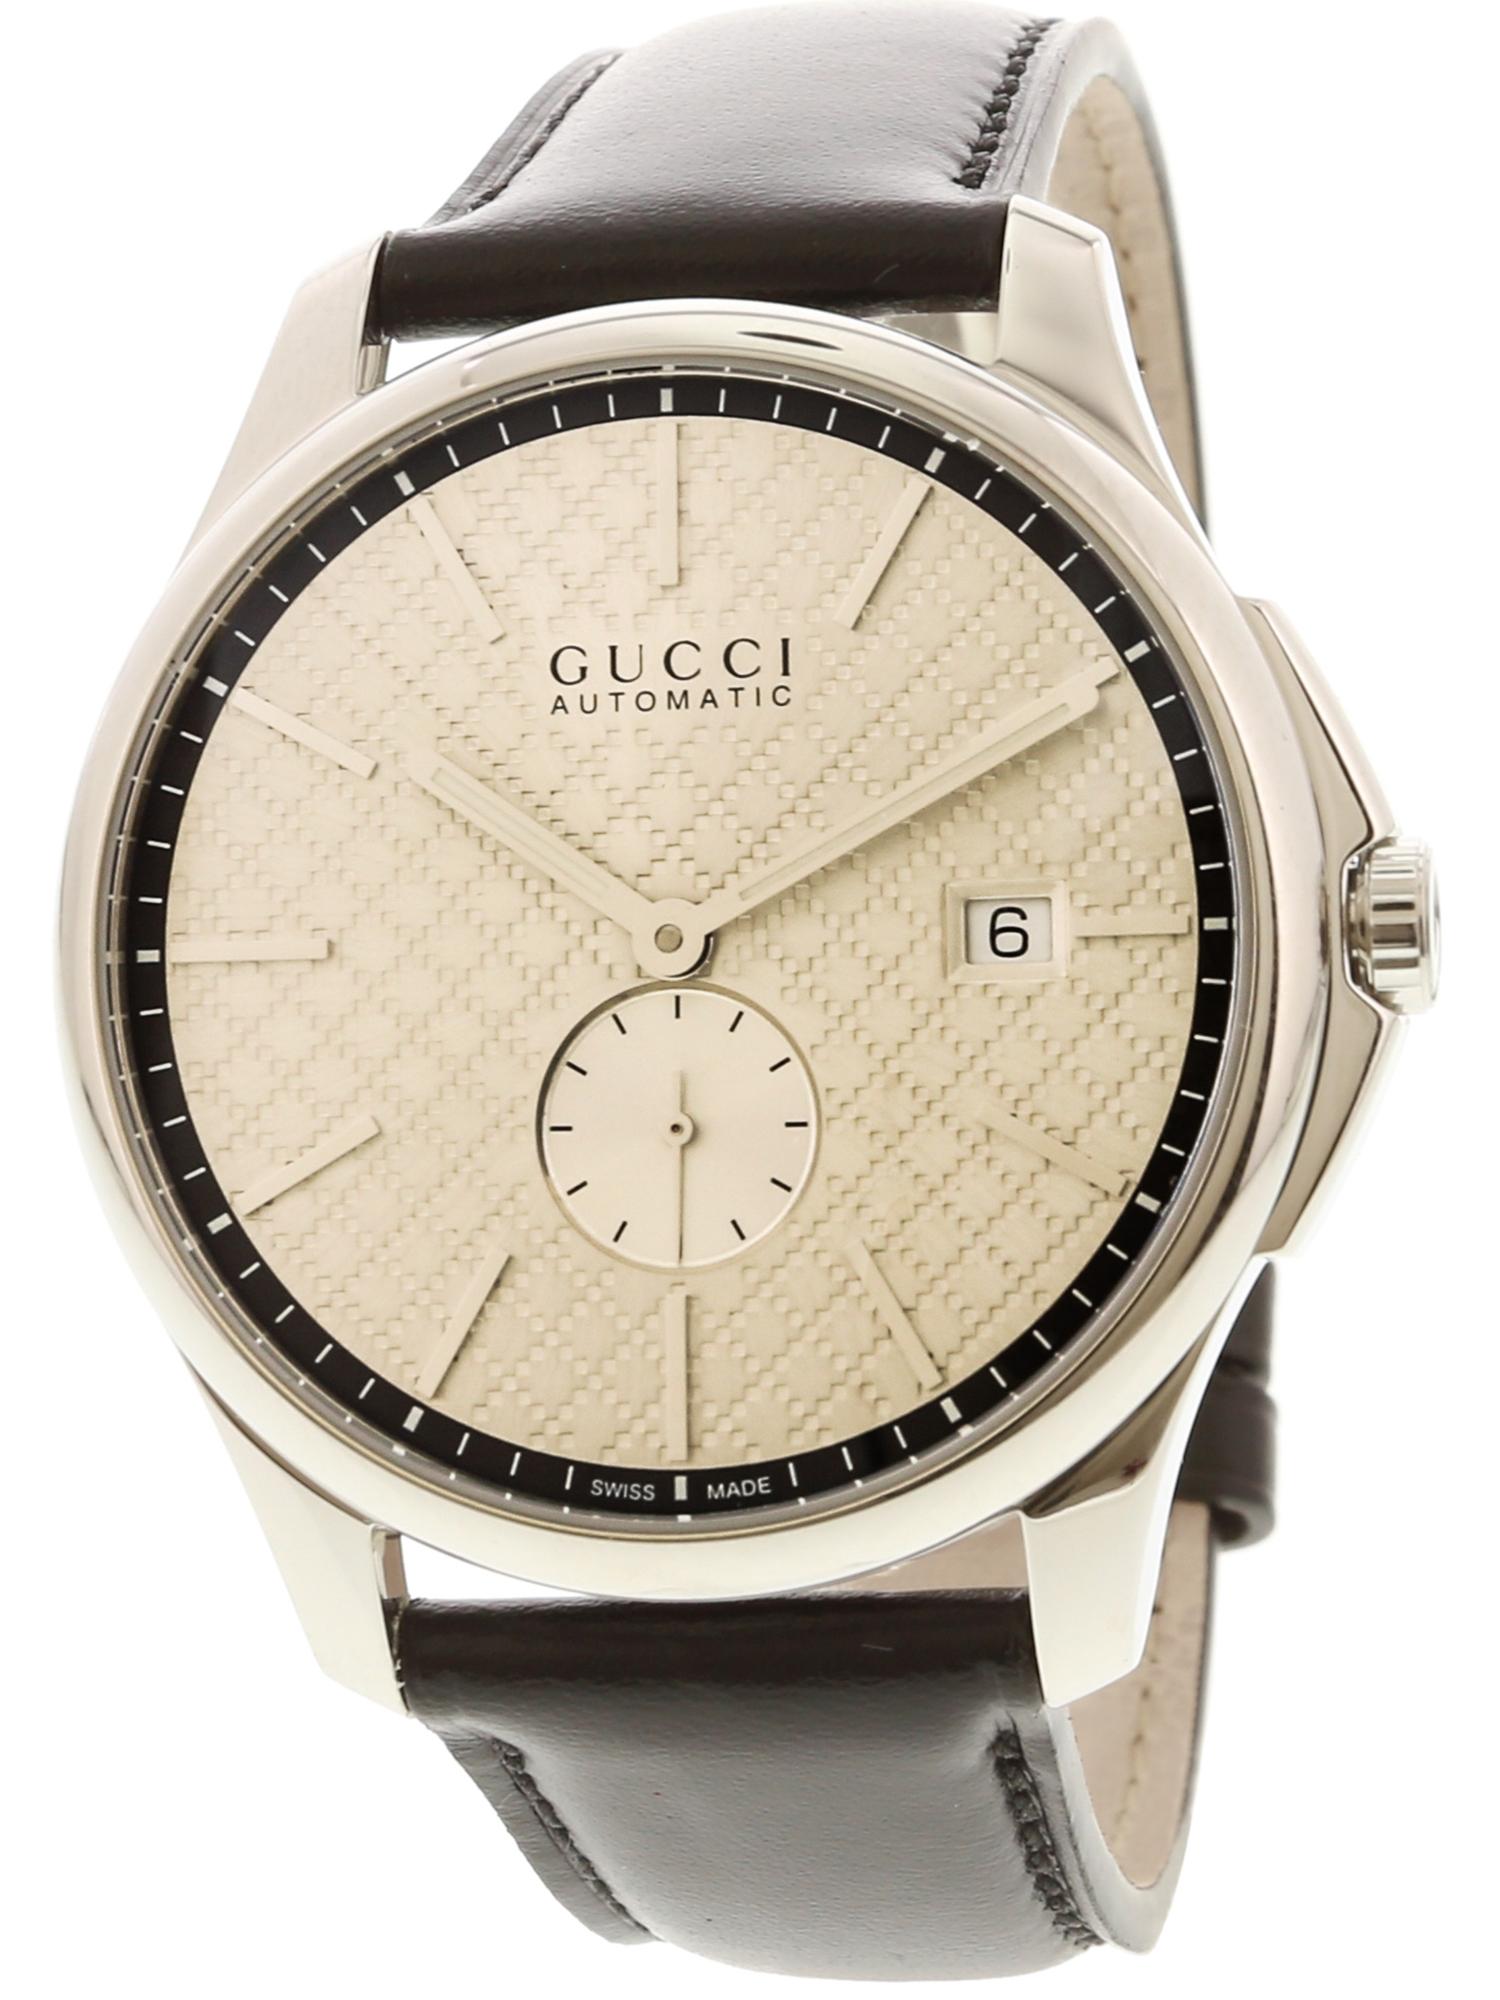 Gucci Men's G-Timeless YA126313 Silver / Black Leather Swiss Automatic Dress Watch